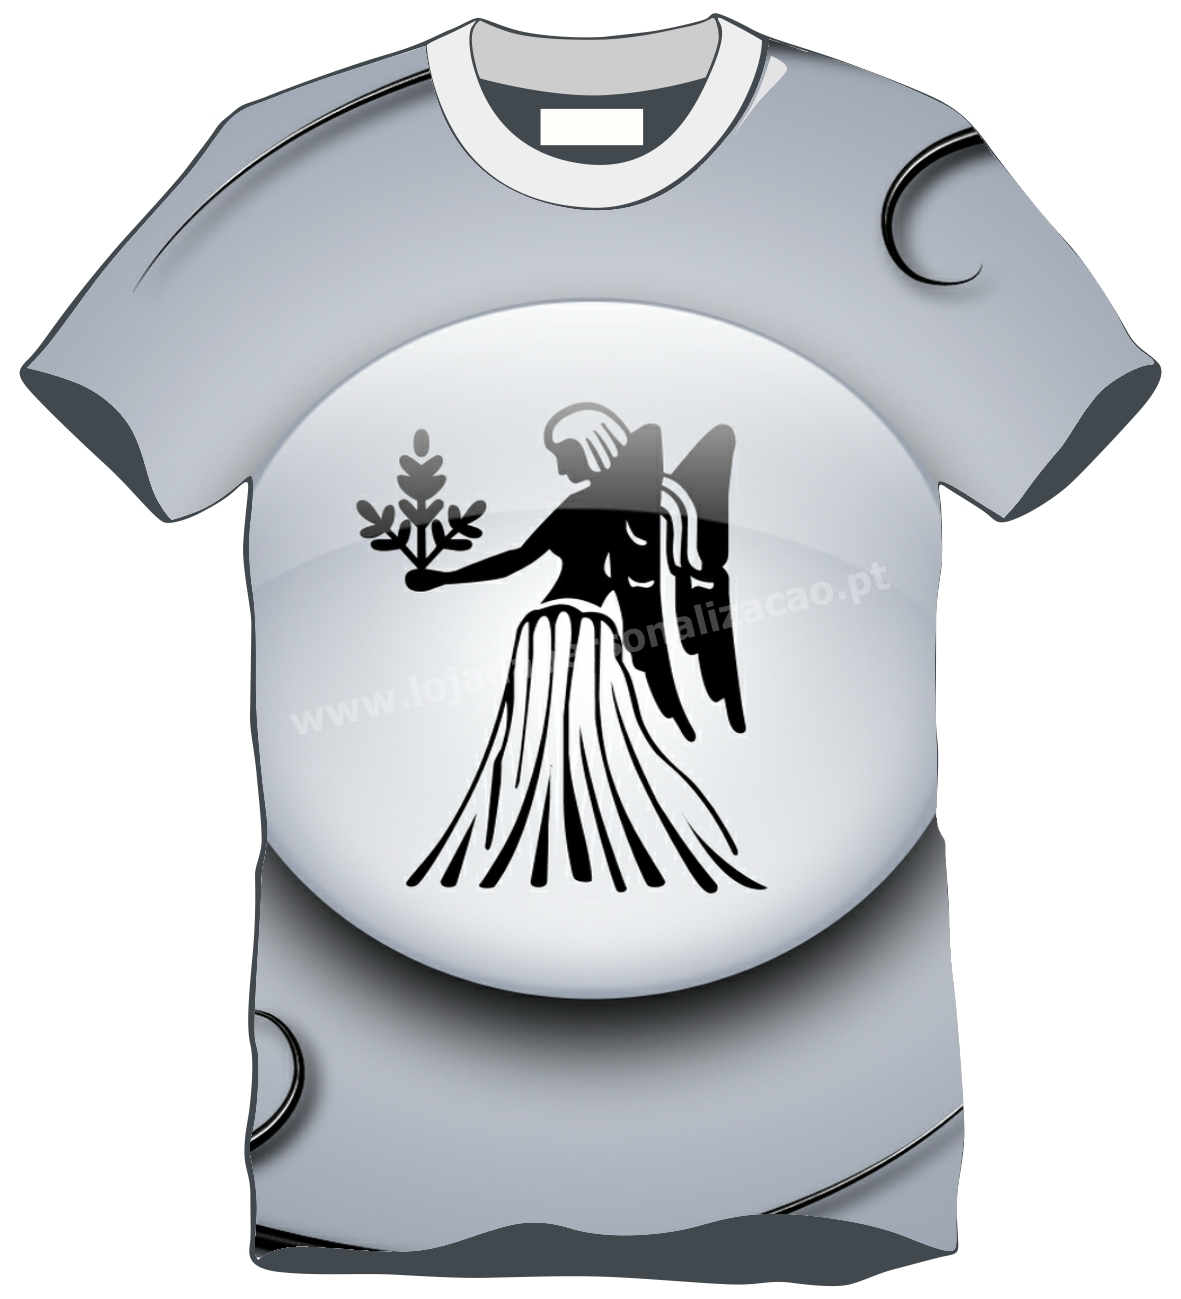 T-Shirt Signos (12)